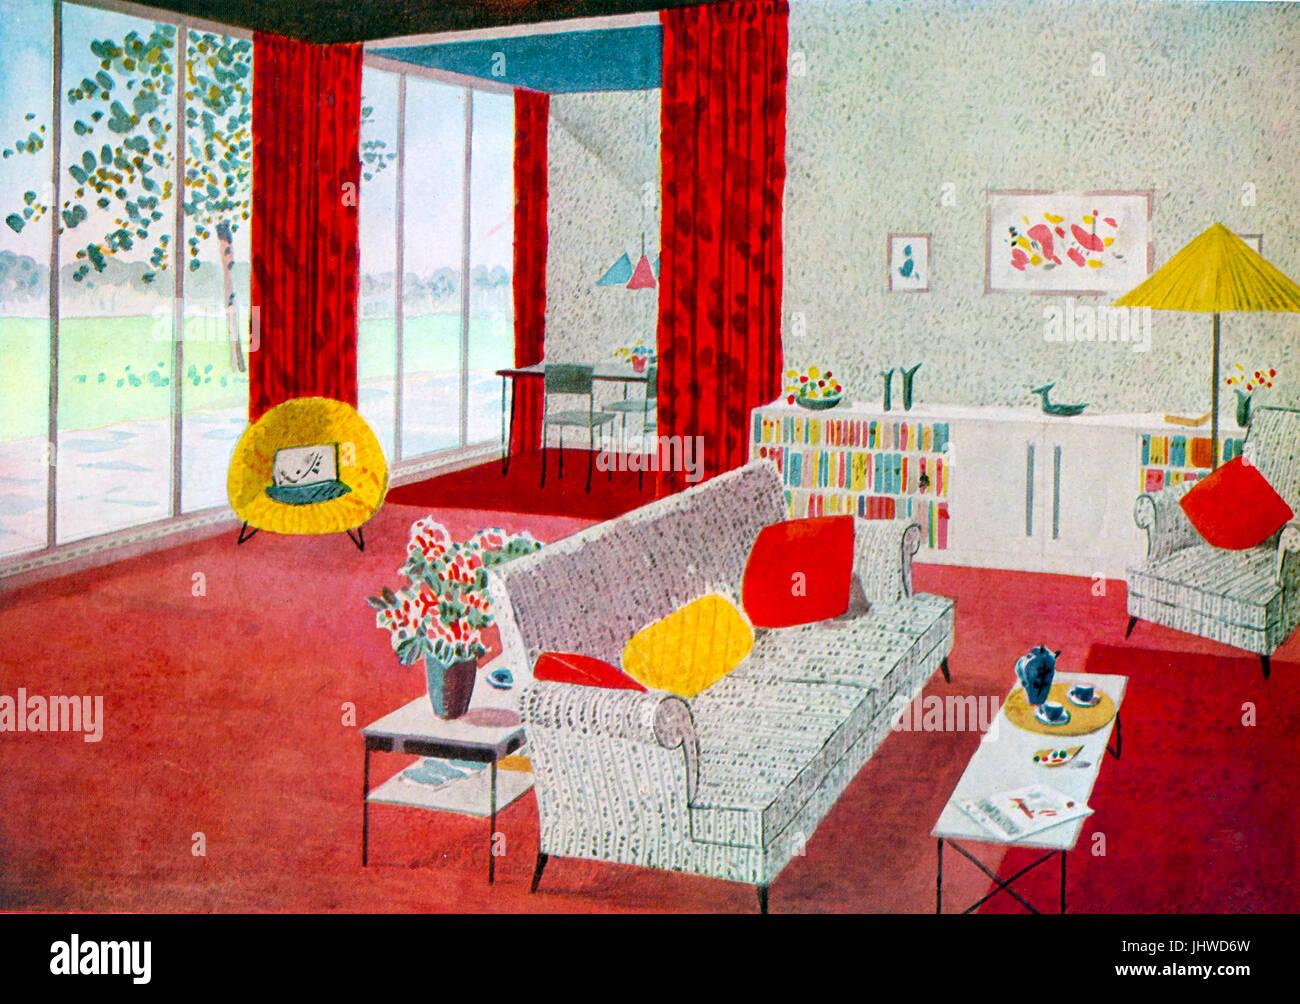 1960s Interior Design Stockfotos & 1960s Interior Design Bilder - Alamy